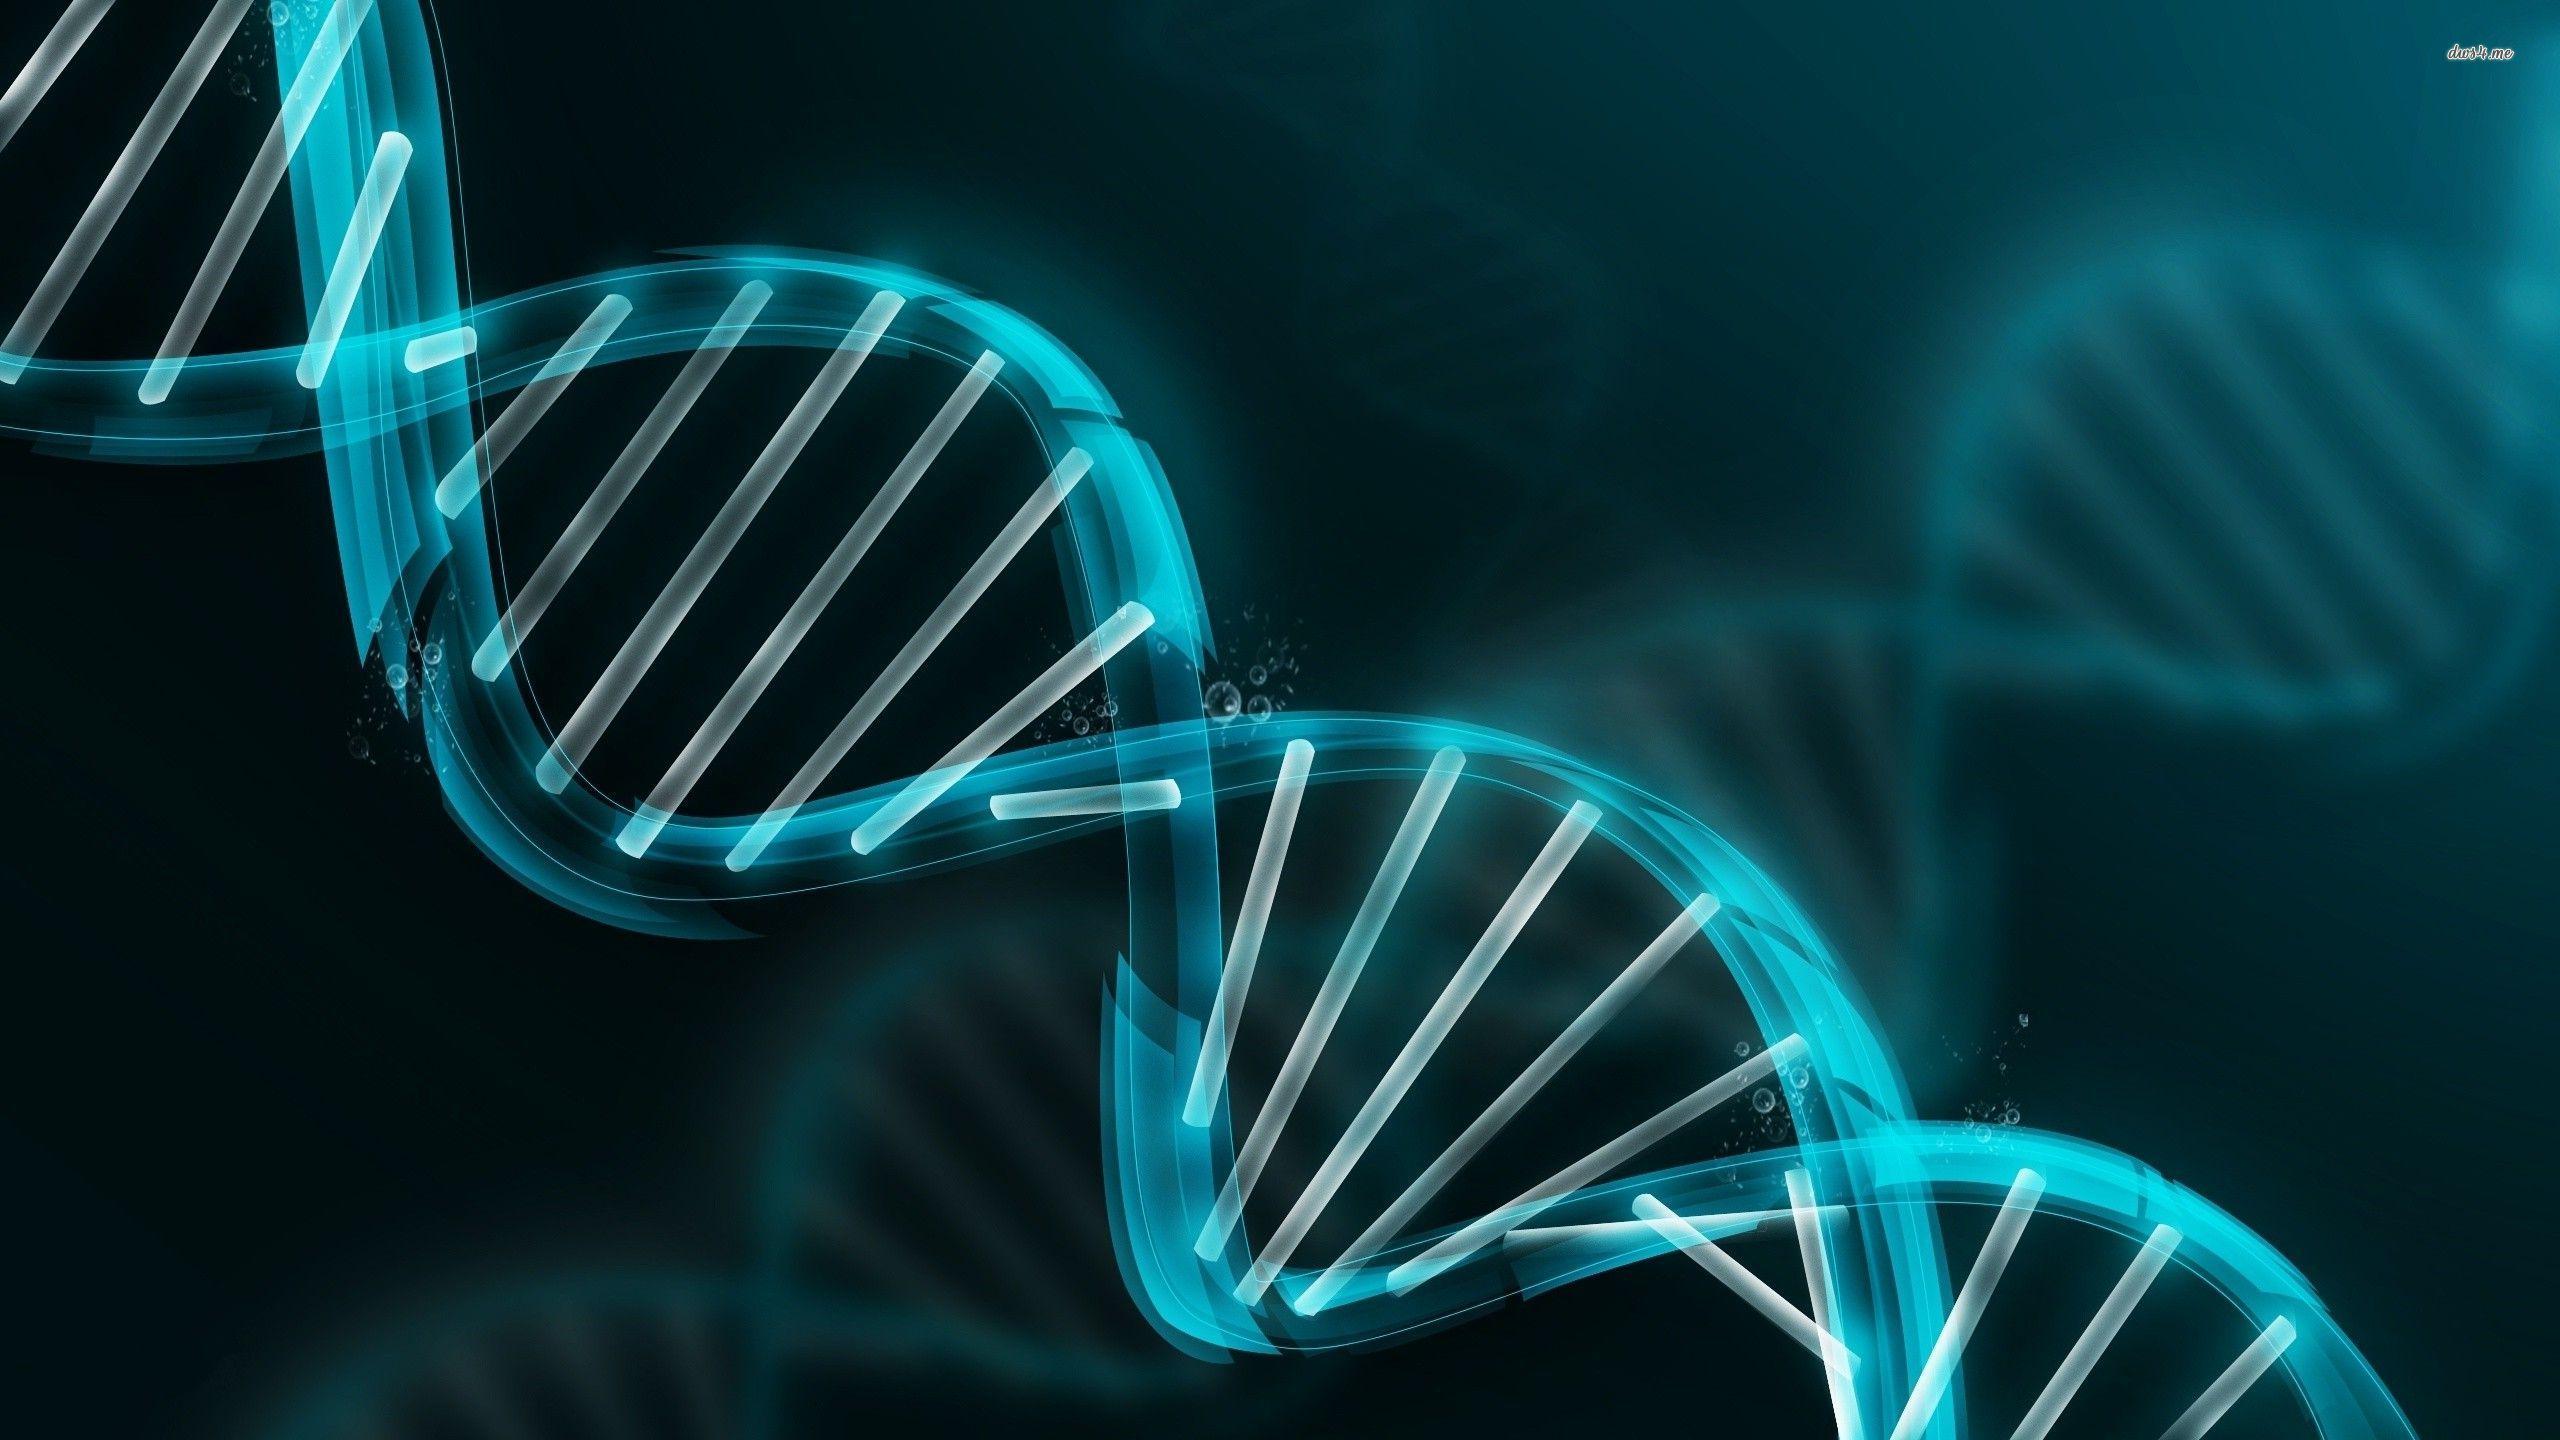 Studies Reveal Wsu Conceived Non Invasive Prenatal Genetic Test Is Accurate Five Weeks Into Pregnancy Today Wayne Wayne State University